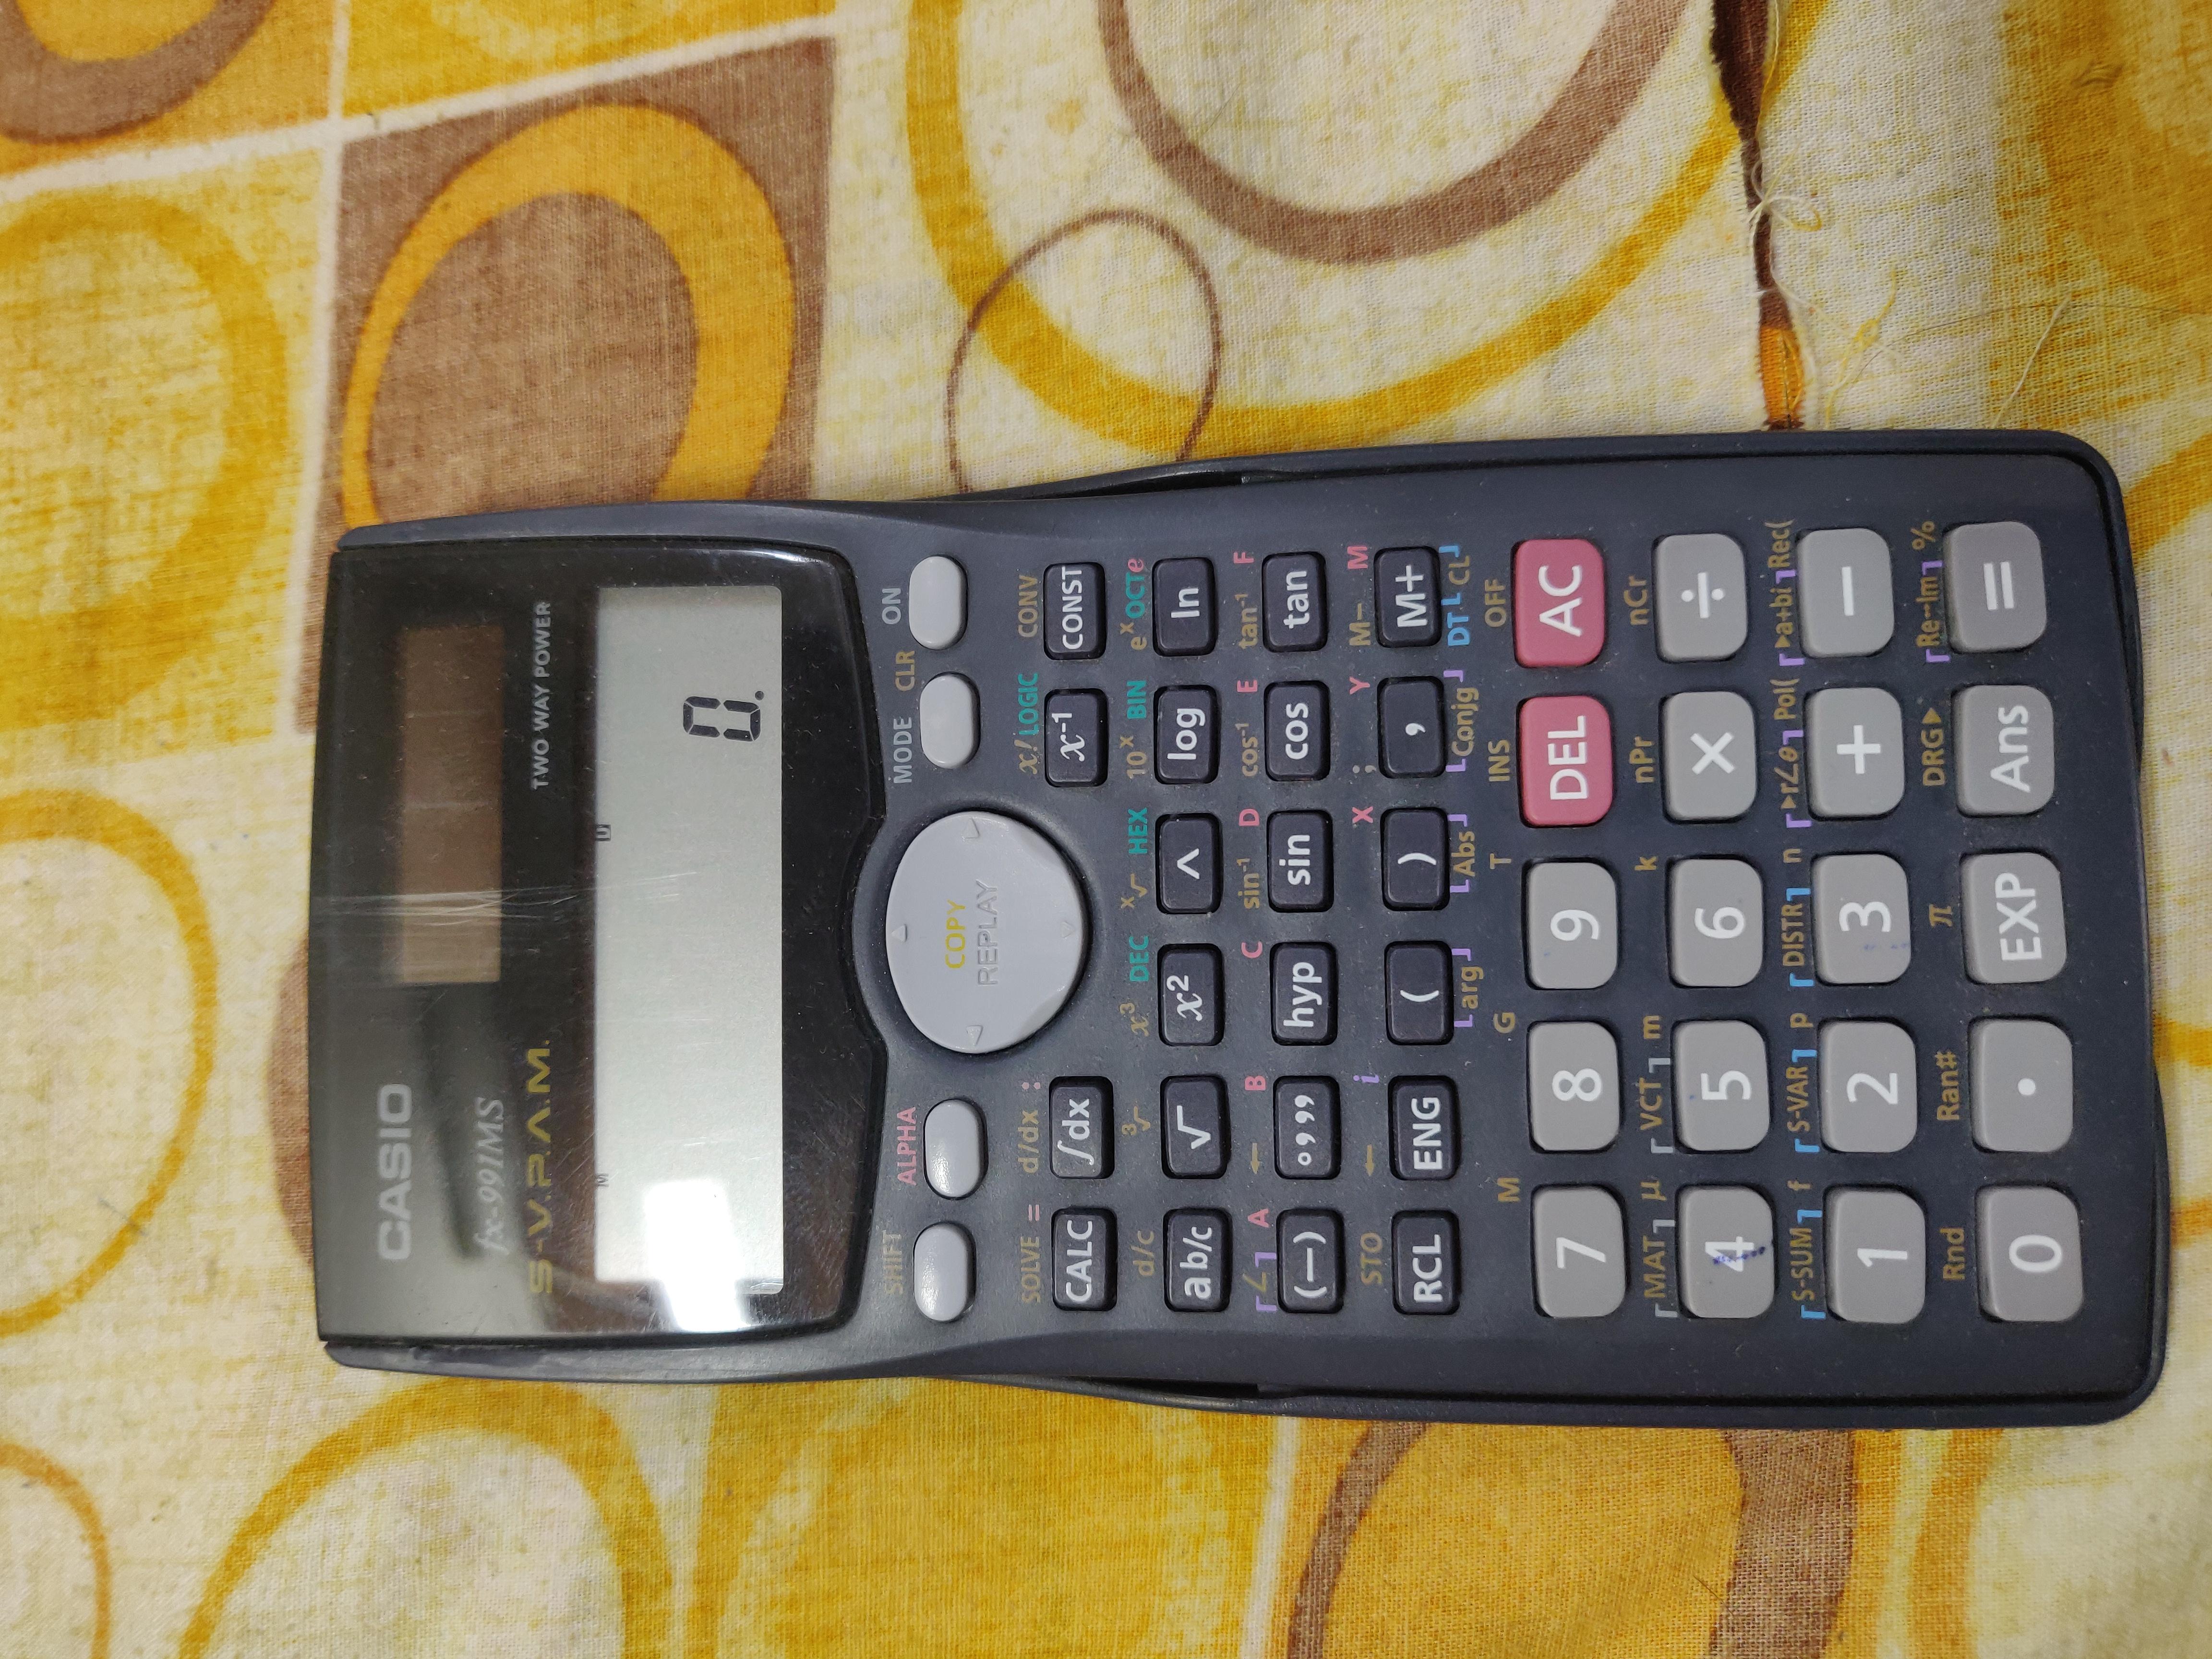 Calculator FX991 ms